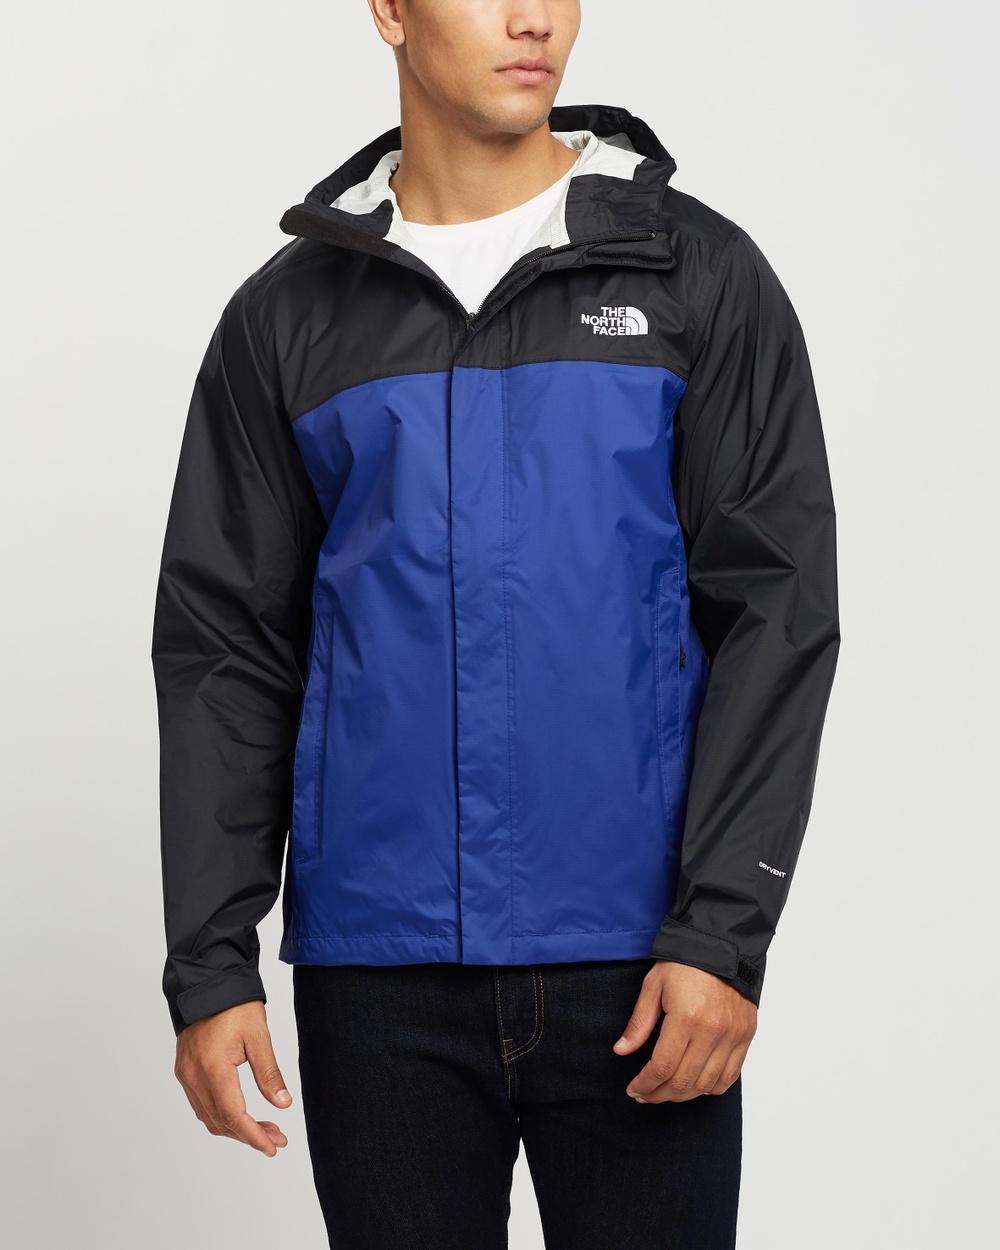 The North Face Venture 2 Jacket Coats & Jackets Bolt Blue TNF Black